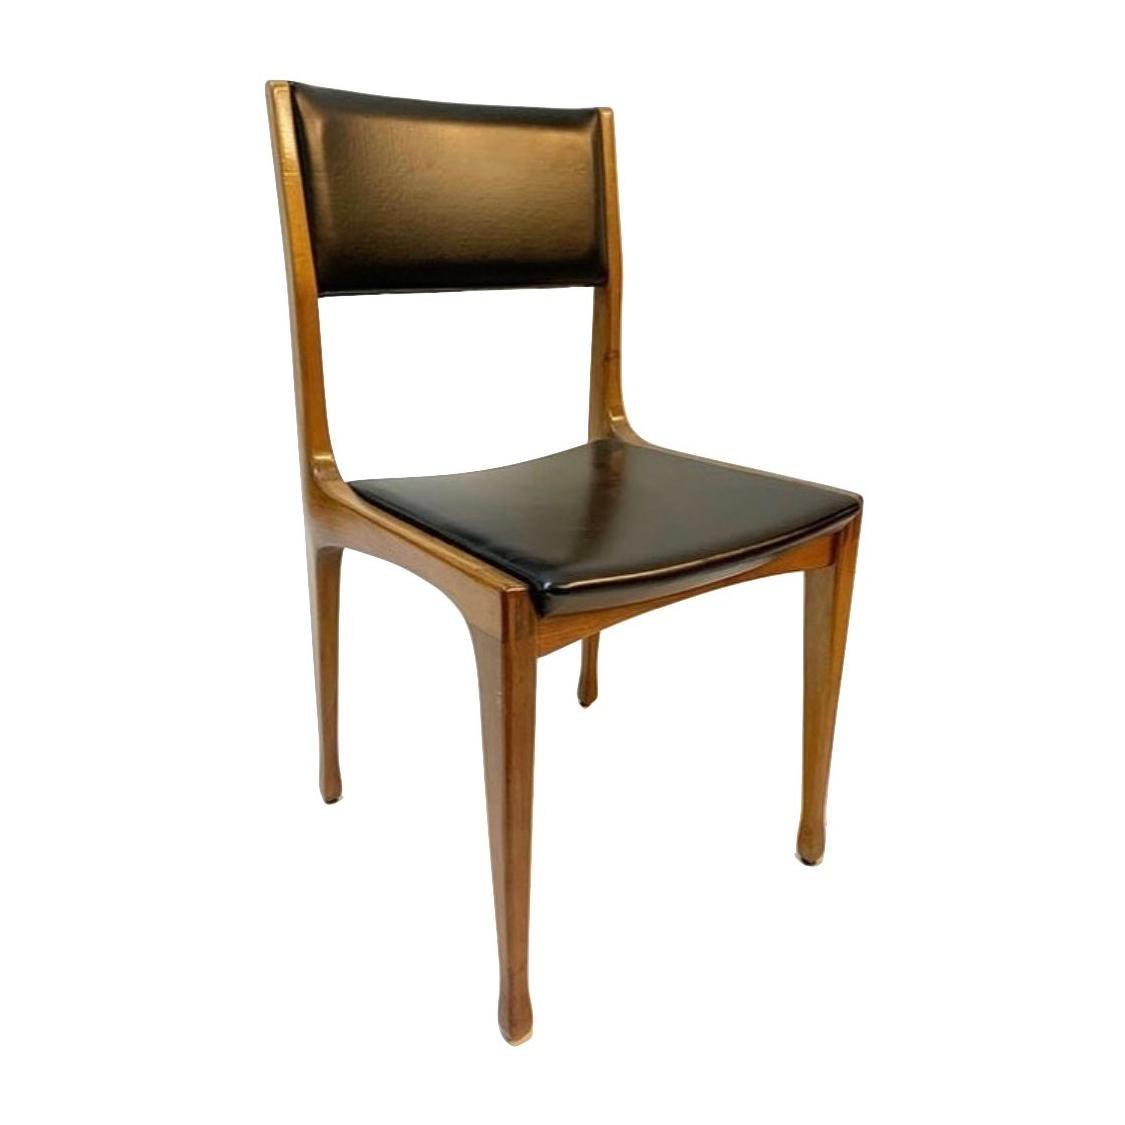 Carlo de Carli Chair 693 Cassina, Set of 16